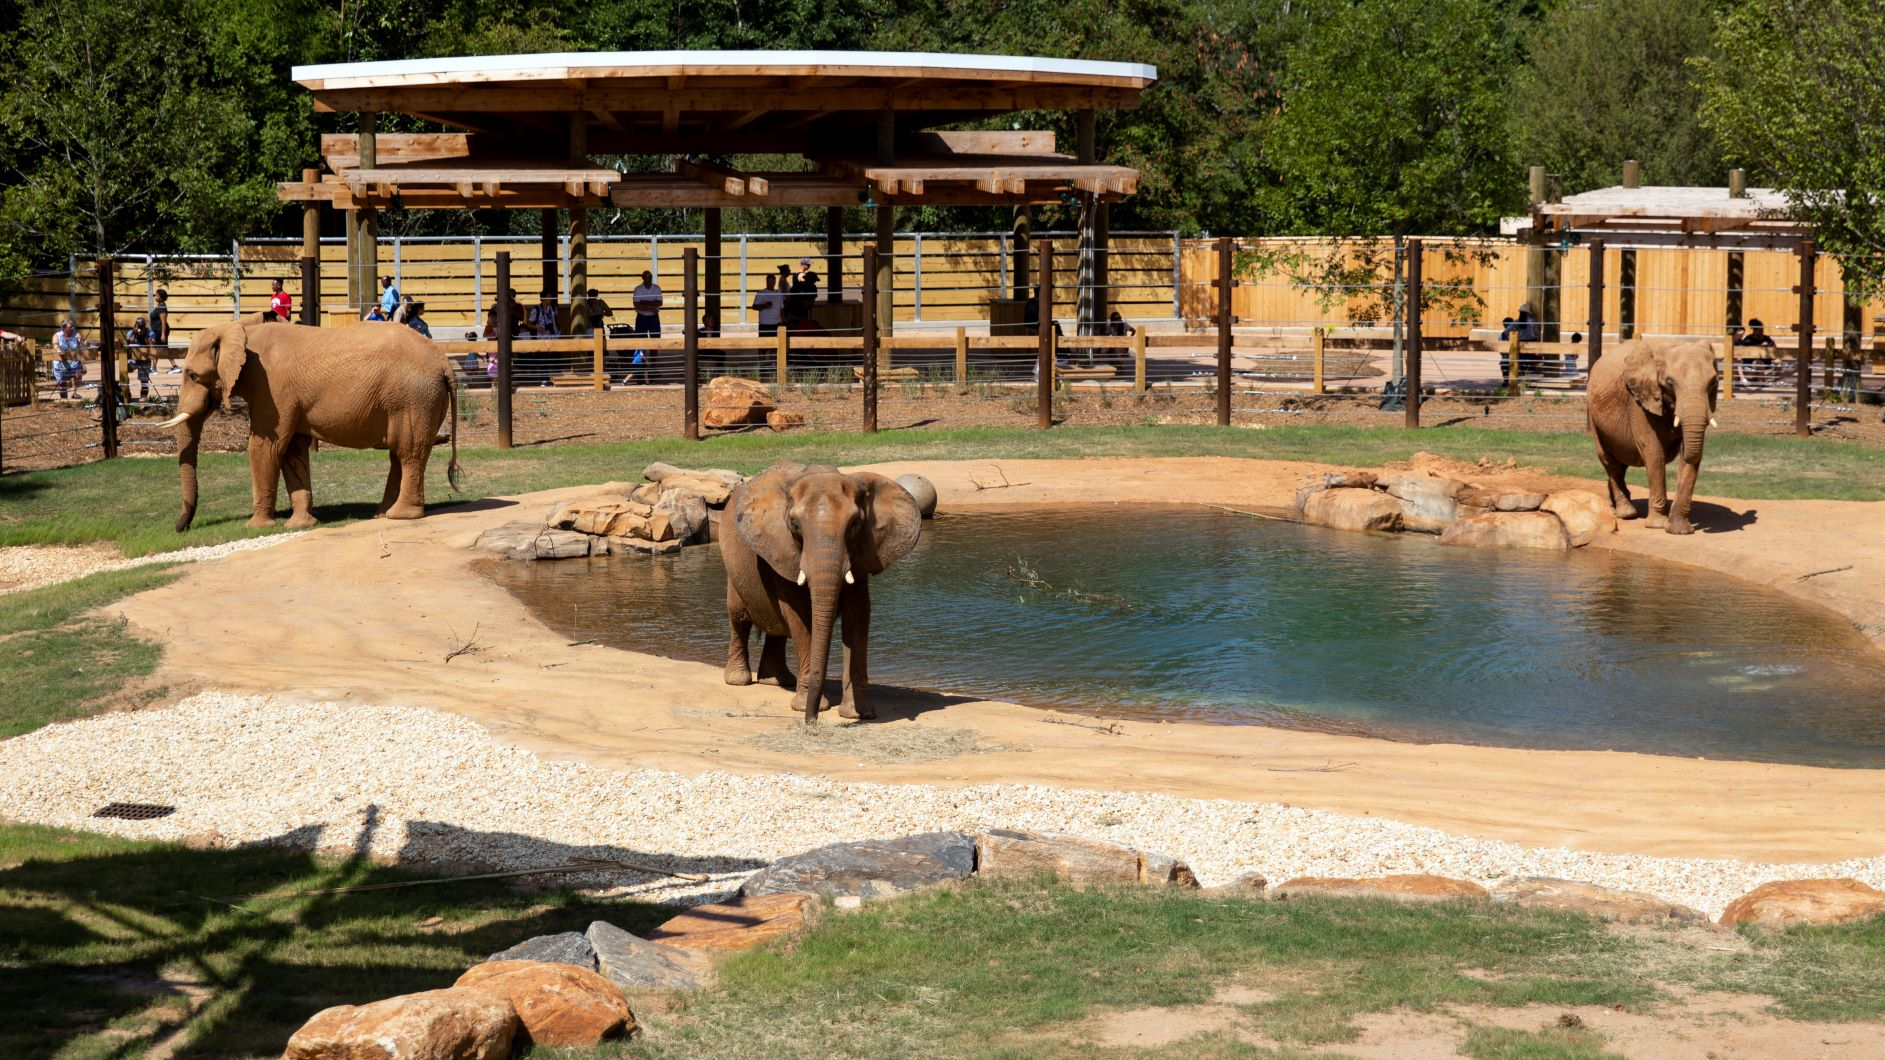 Image of African Savanna exhibit at Zoo Atlanta